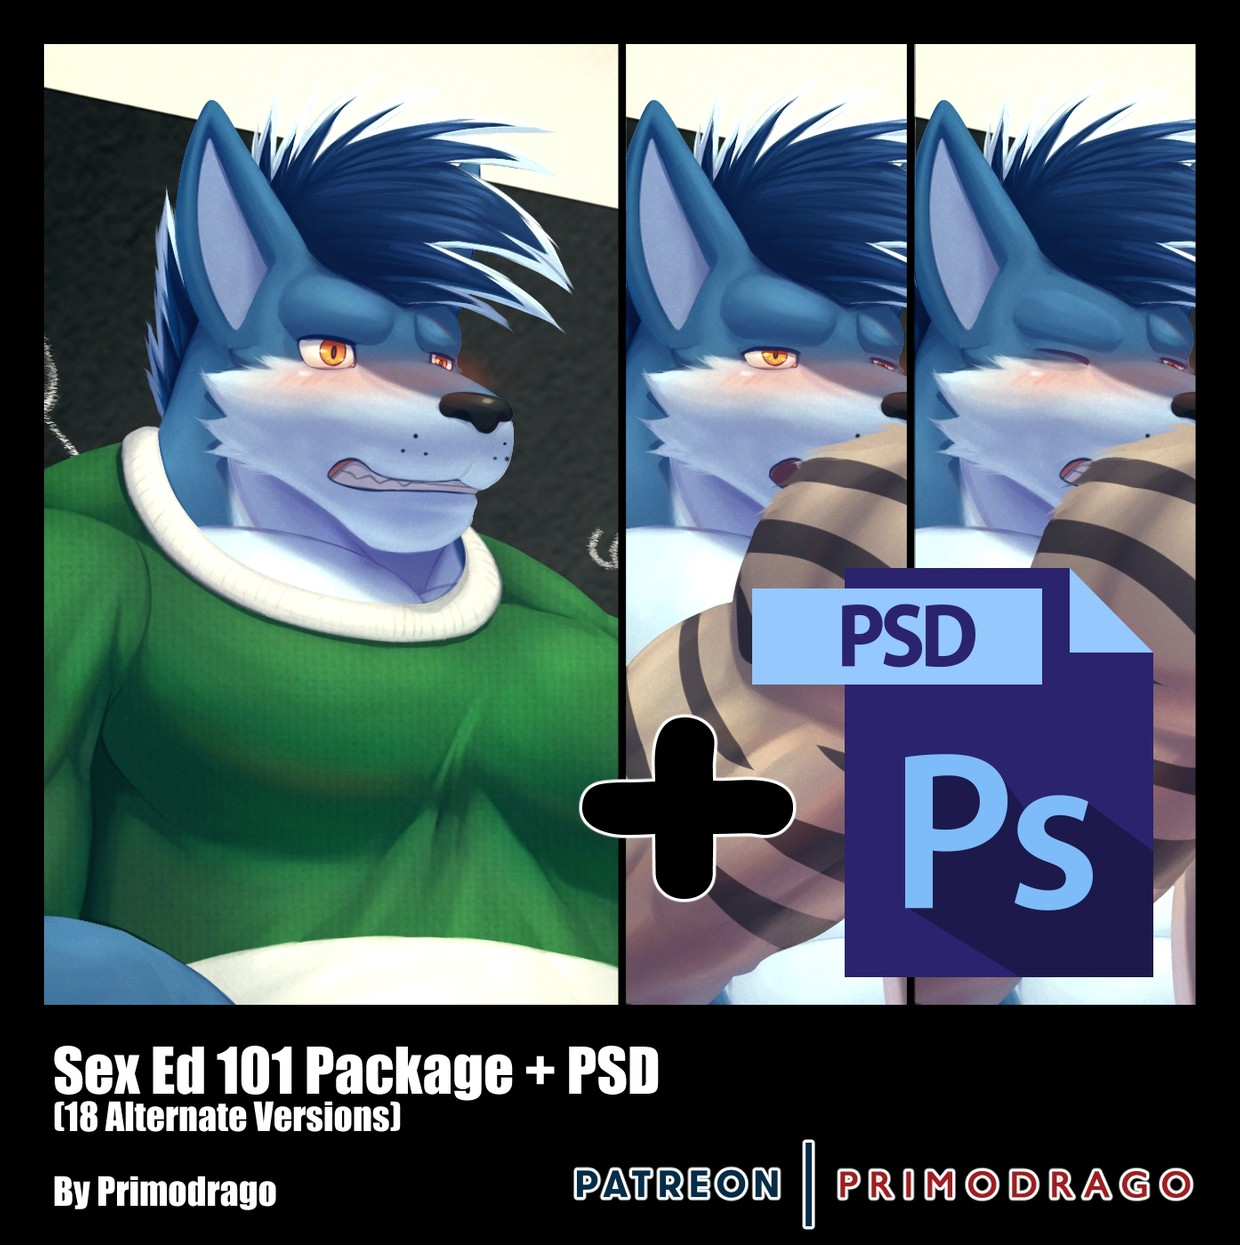 Sex Ed 101 Theme + PSD File